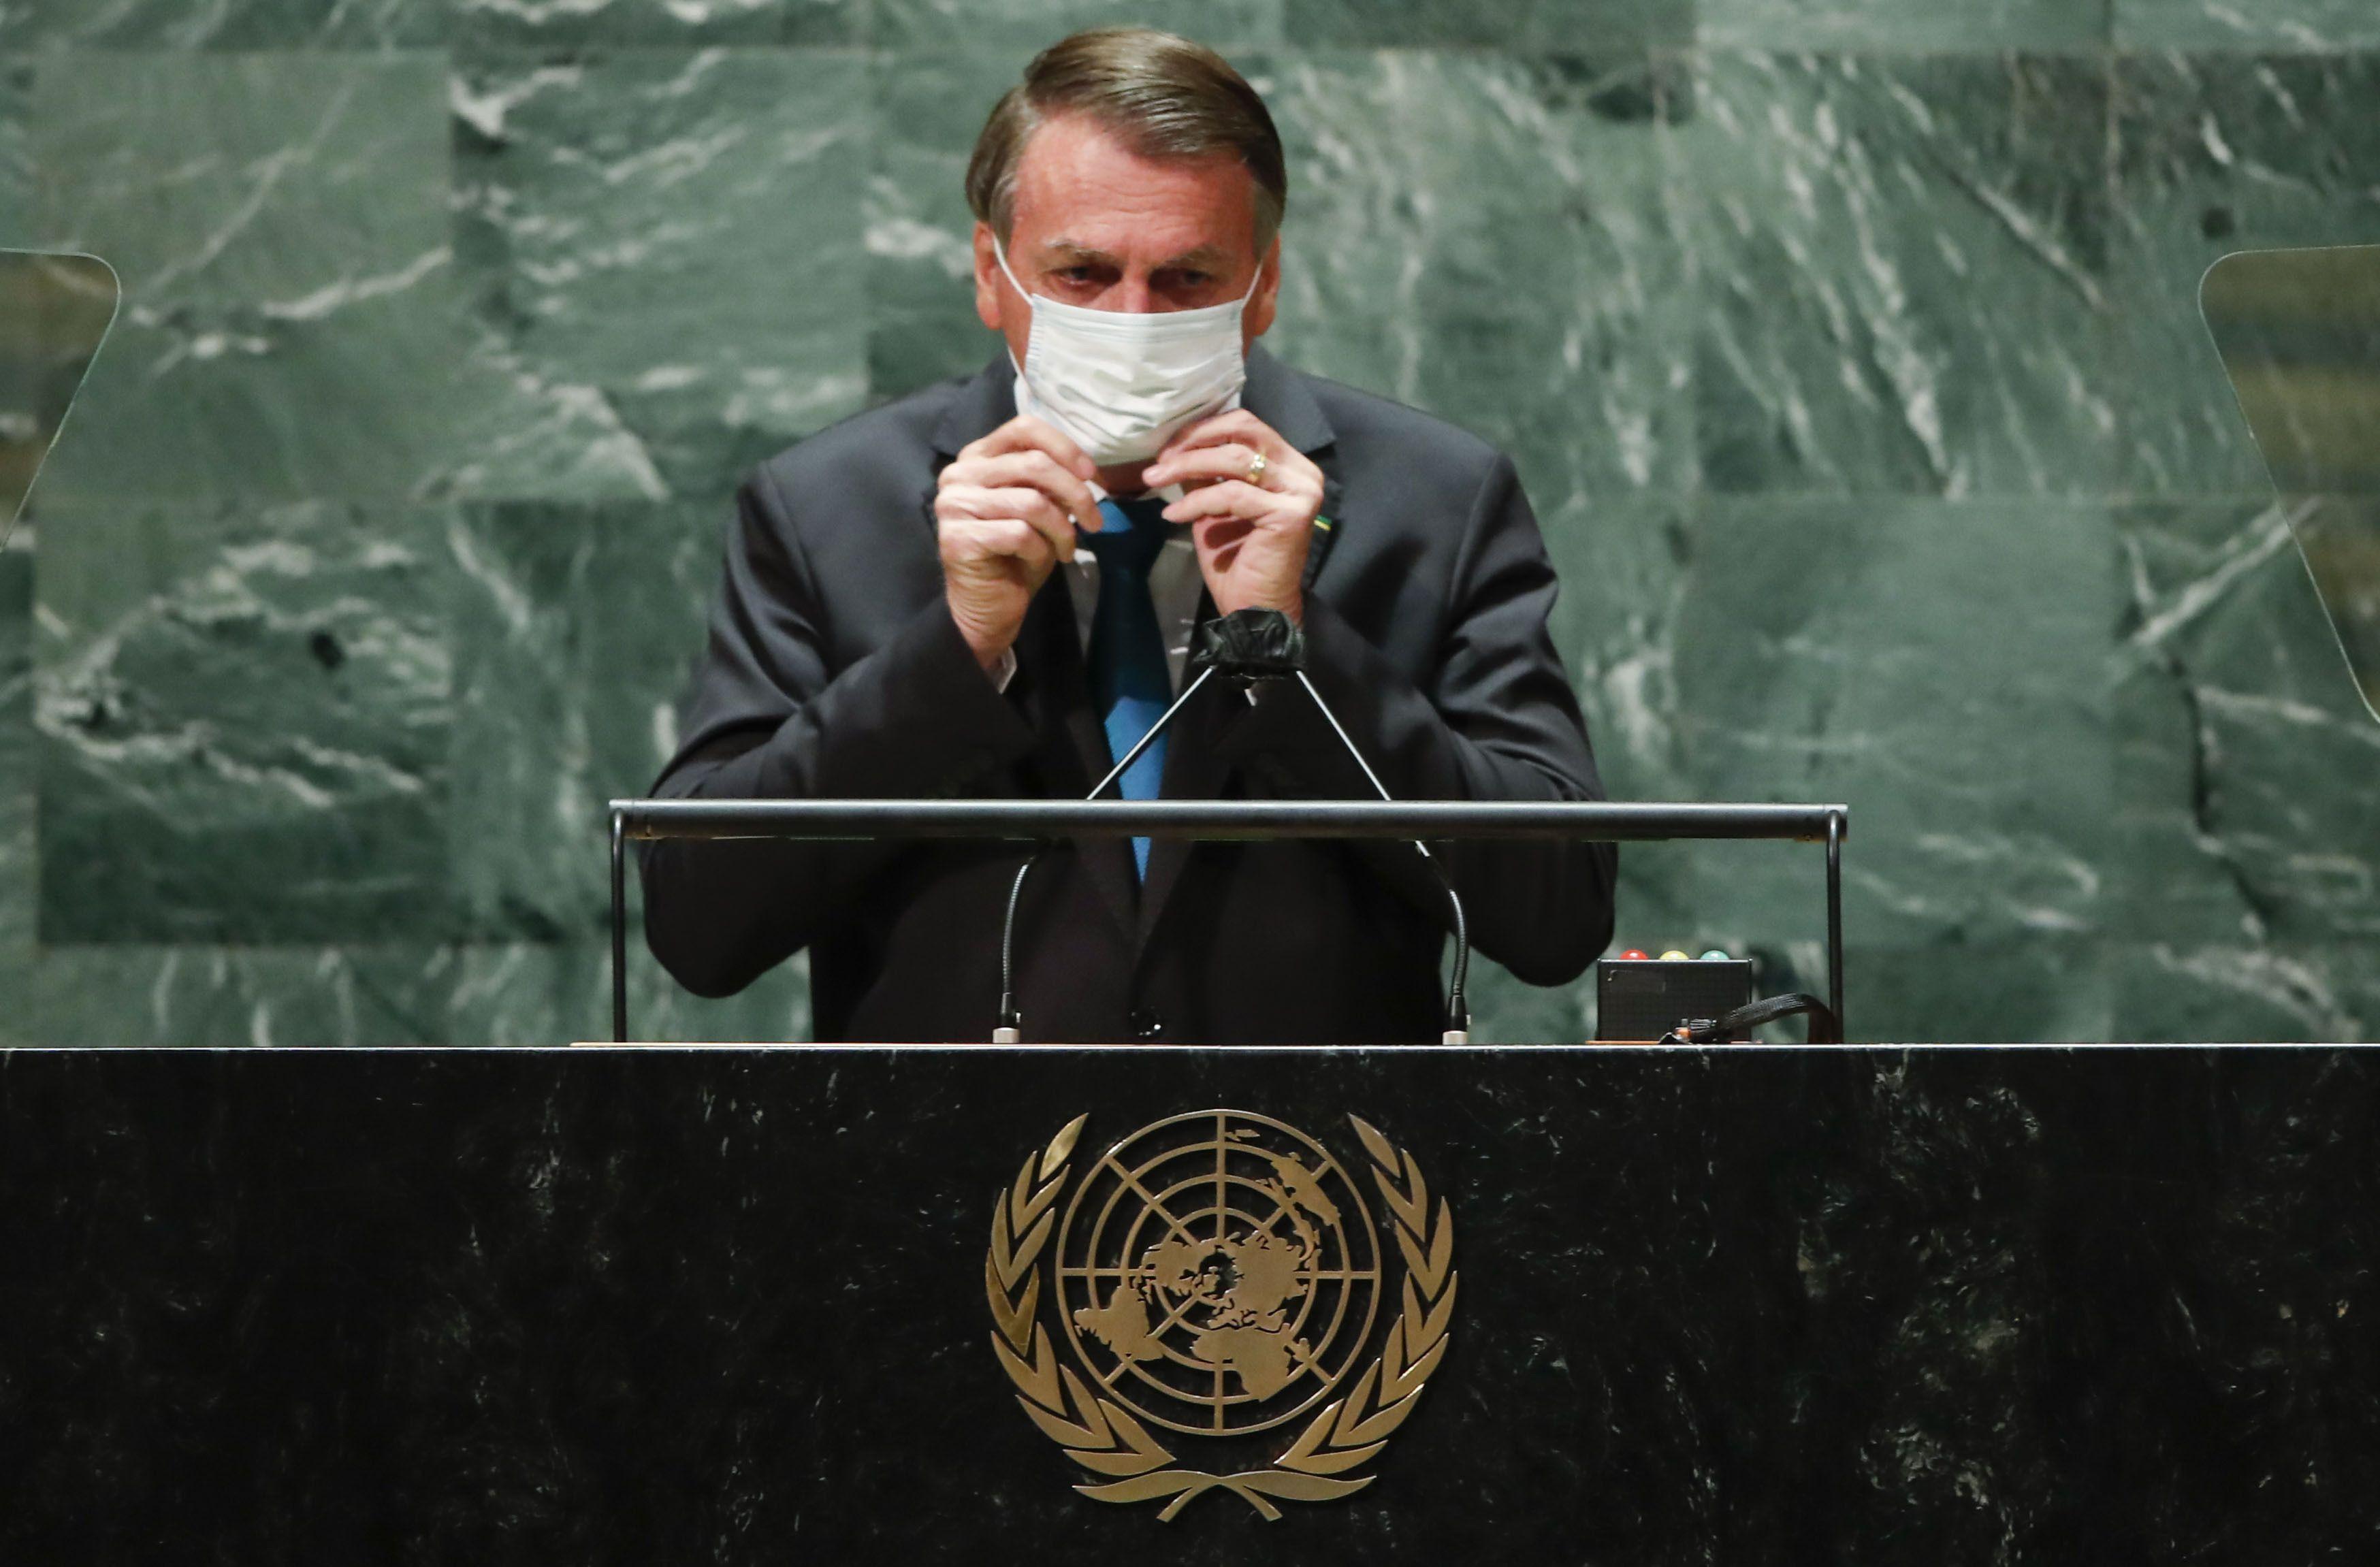 ministro de salud de brasil da positivo al coronavirus en ny